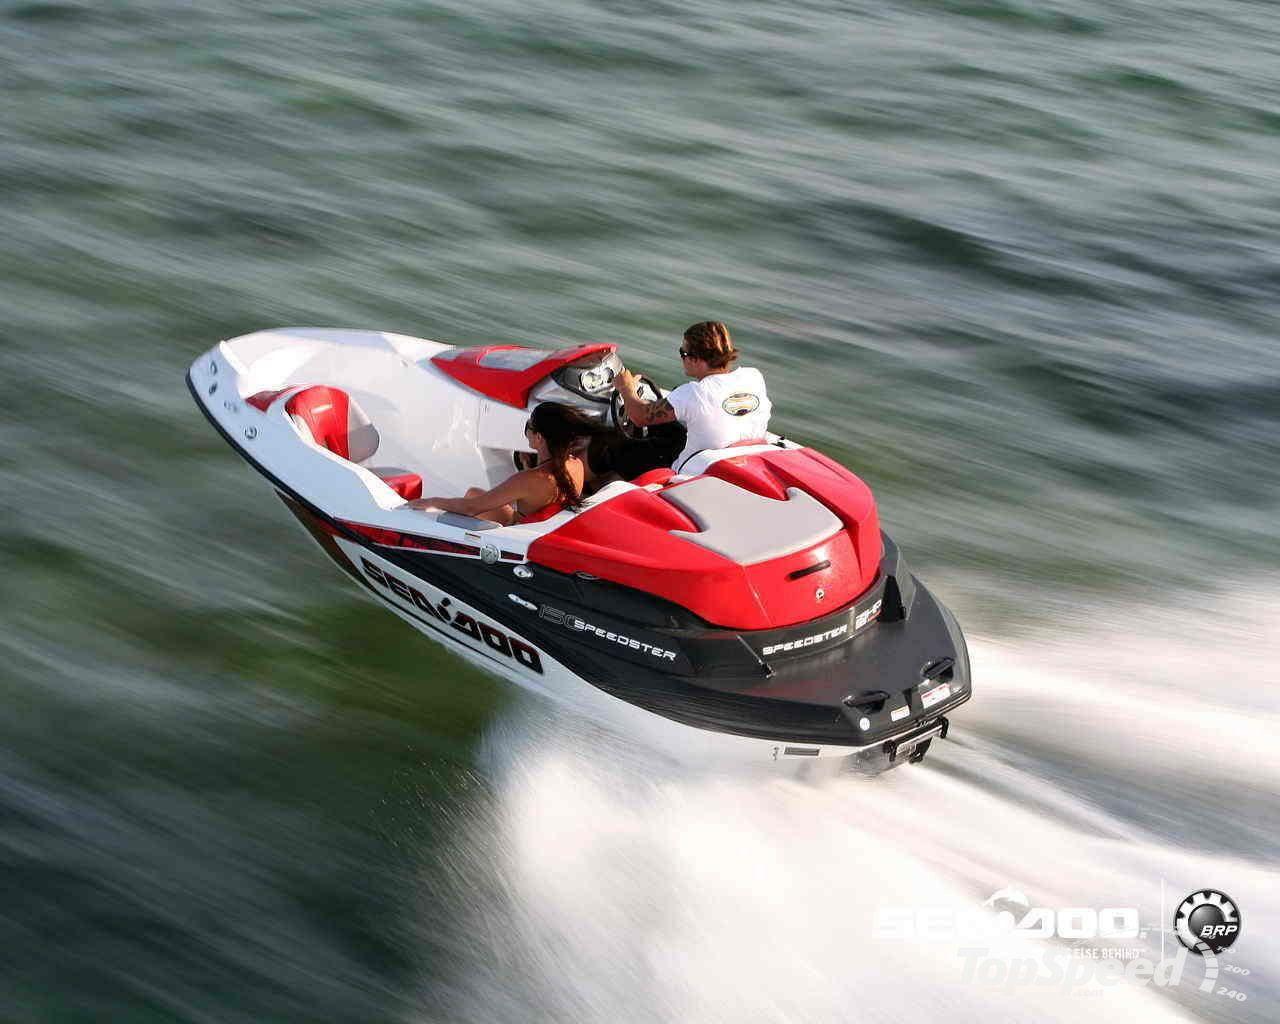 2007 Sea Doo 150 Speedste Boats And Toys Pinterest